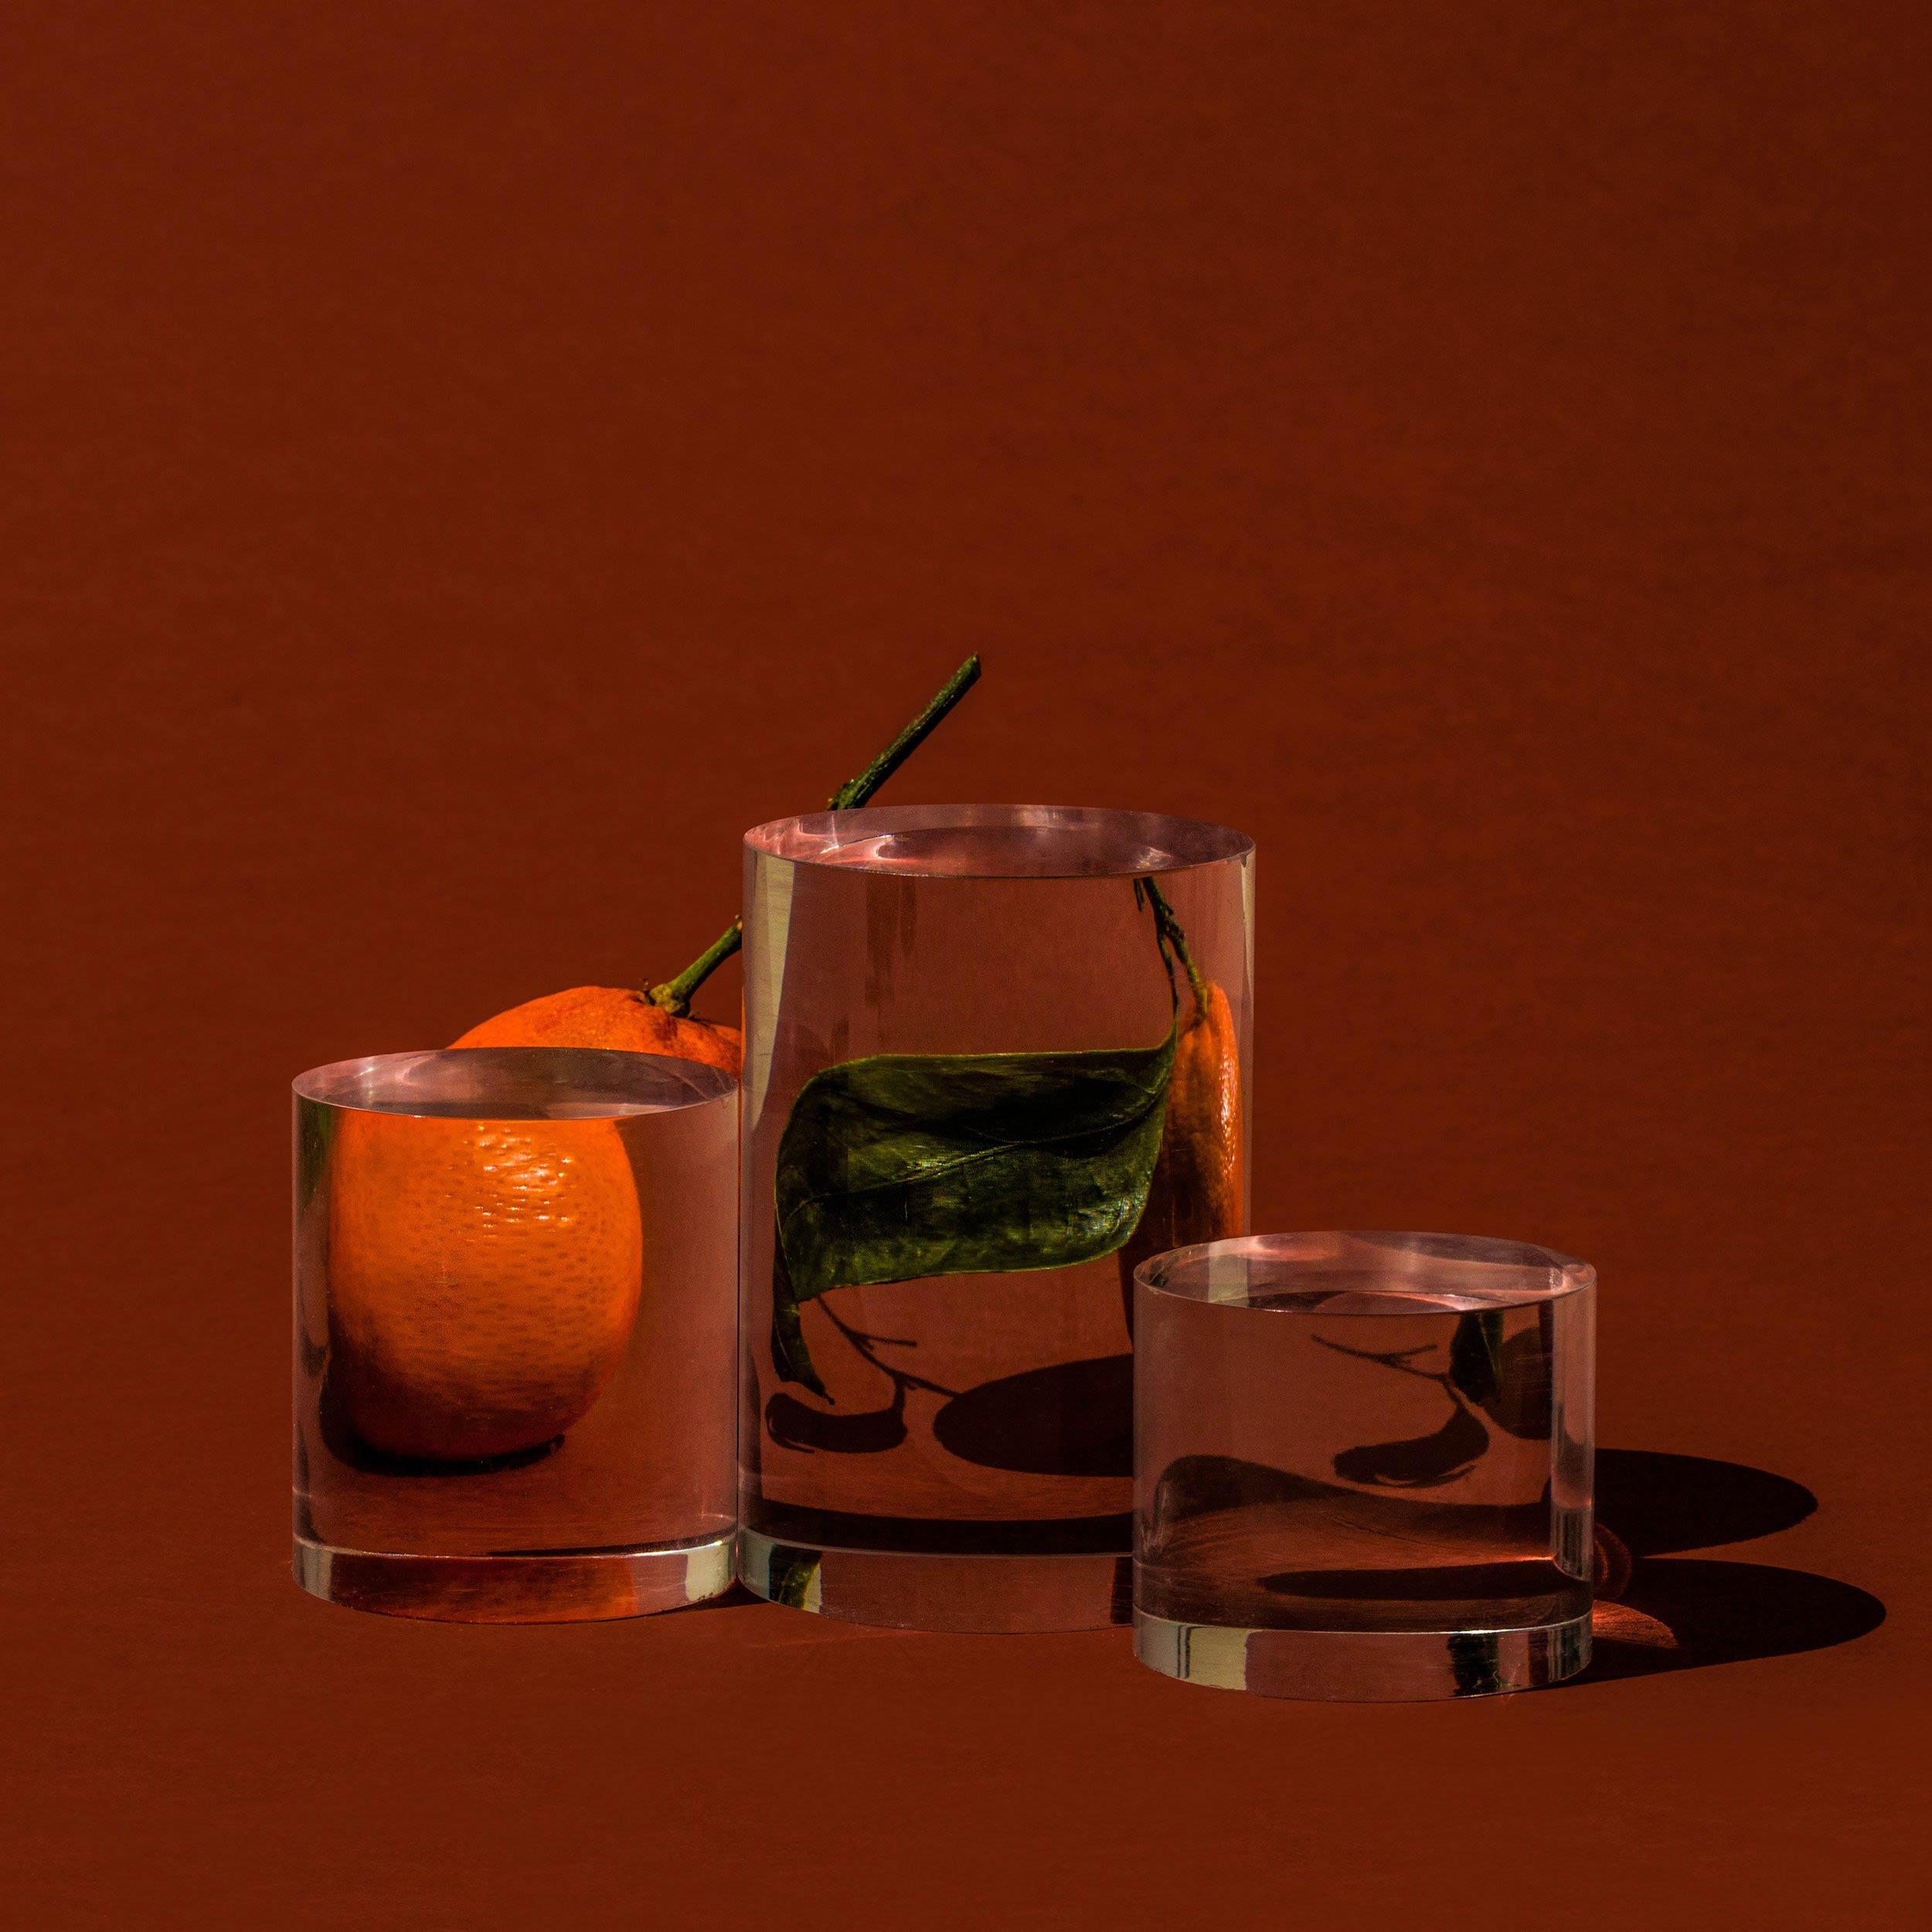 distorded-susan-sakoff-still-life-photography-4